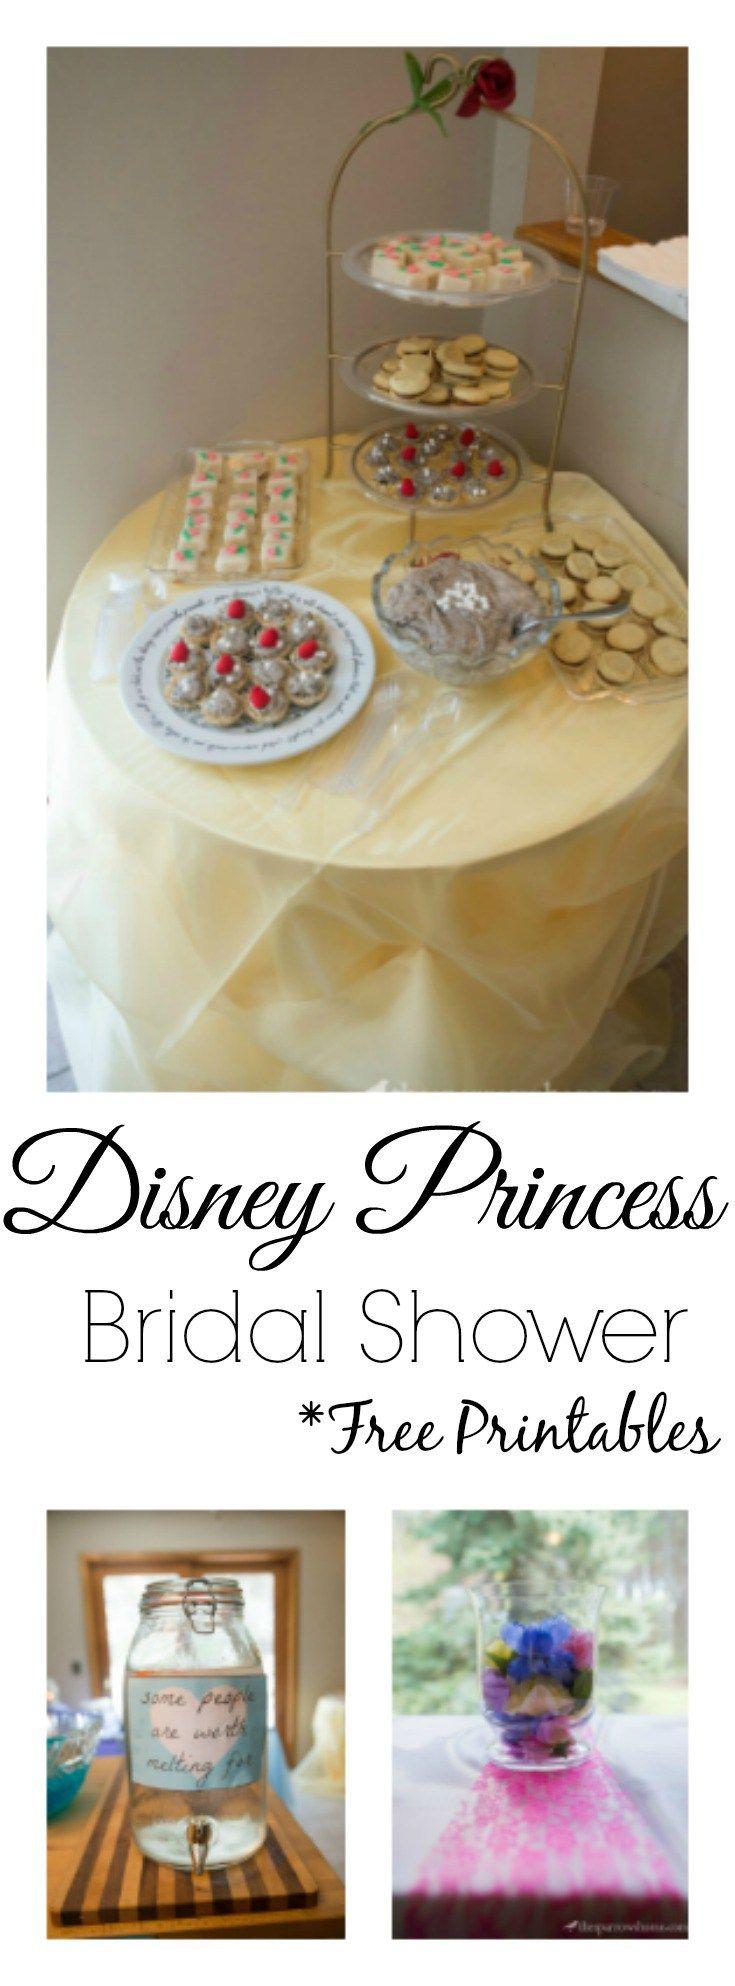 A Disney Princess themed bridal shower. Decorations, menu ideas and free printables!